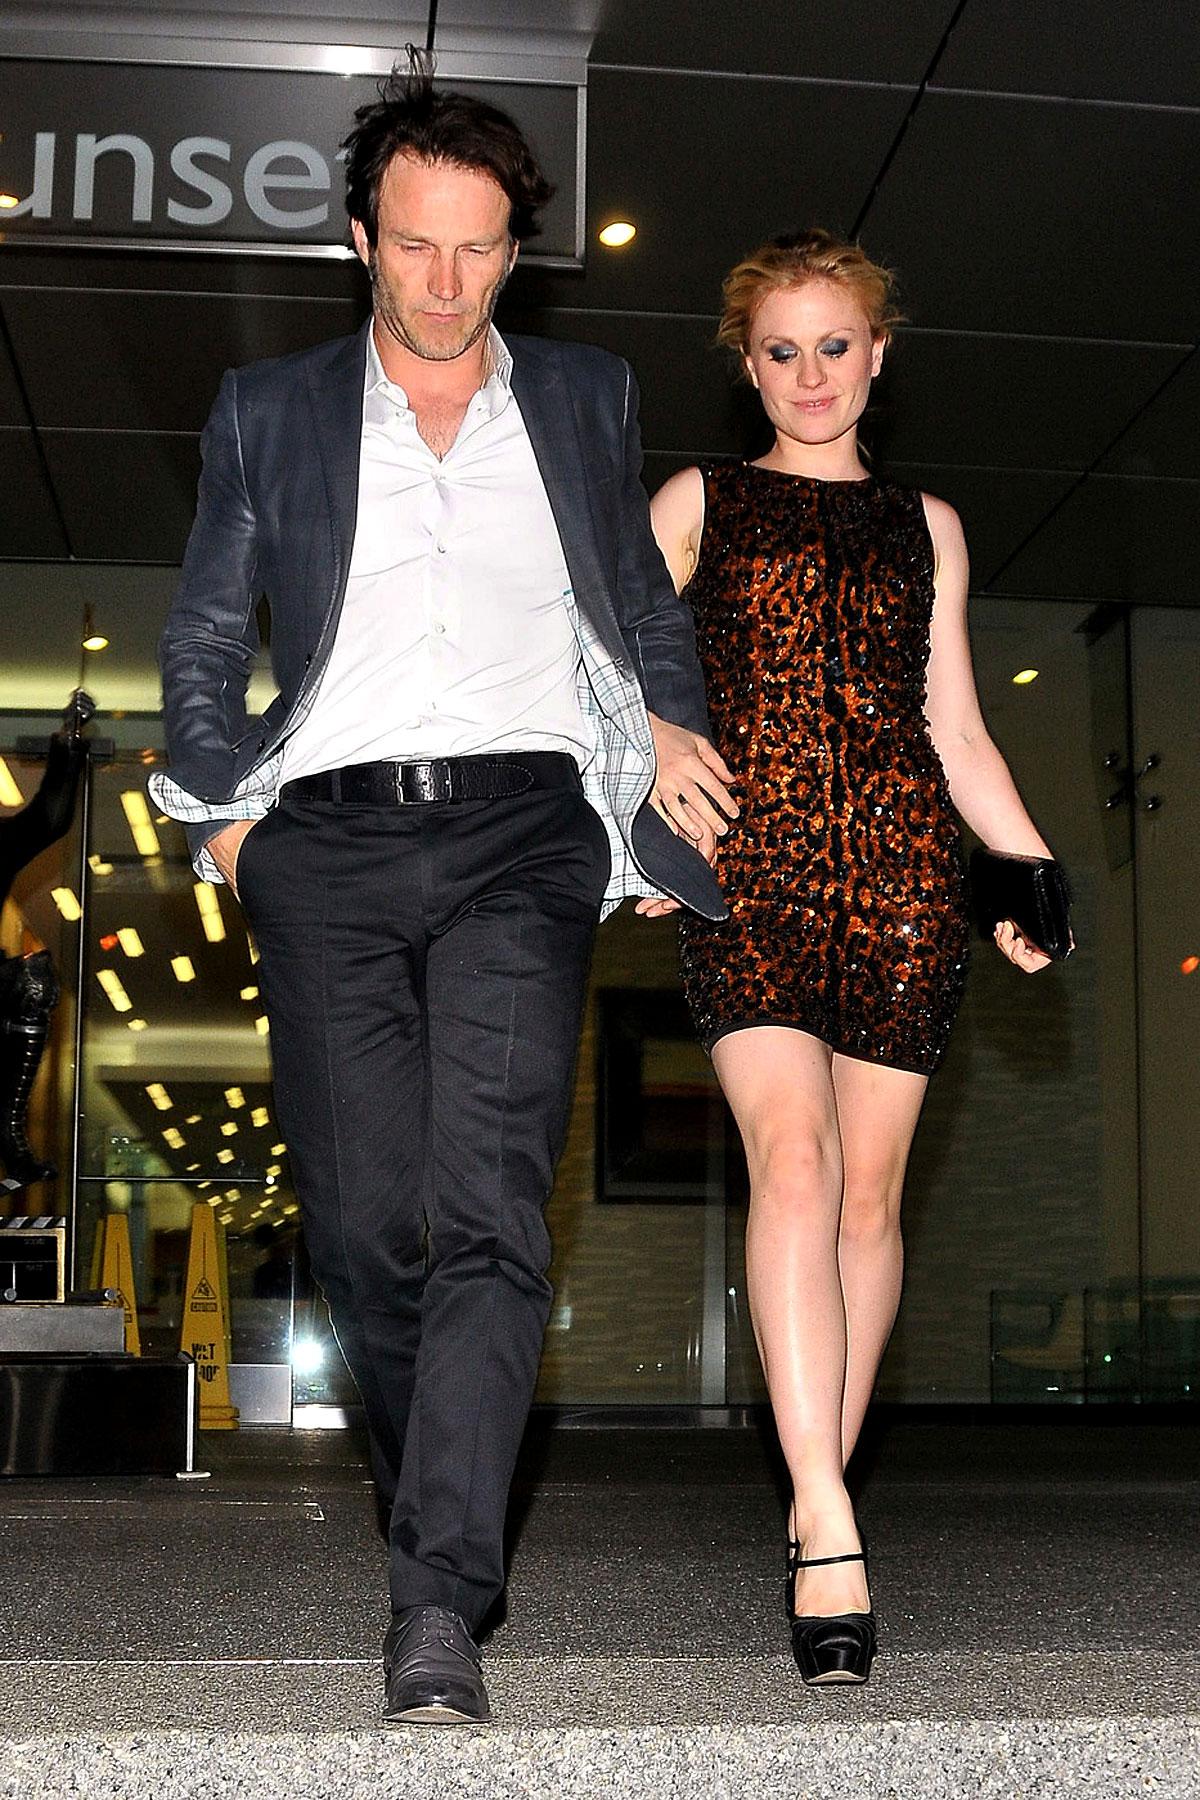 Fashion FTW: Anna Paquin Proves It's Stil Cool To Wear Leopard Spots (PHOTOS)